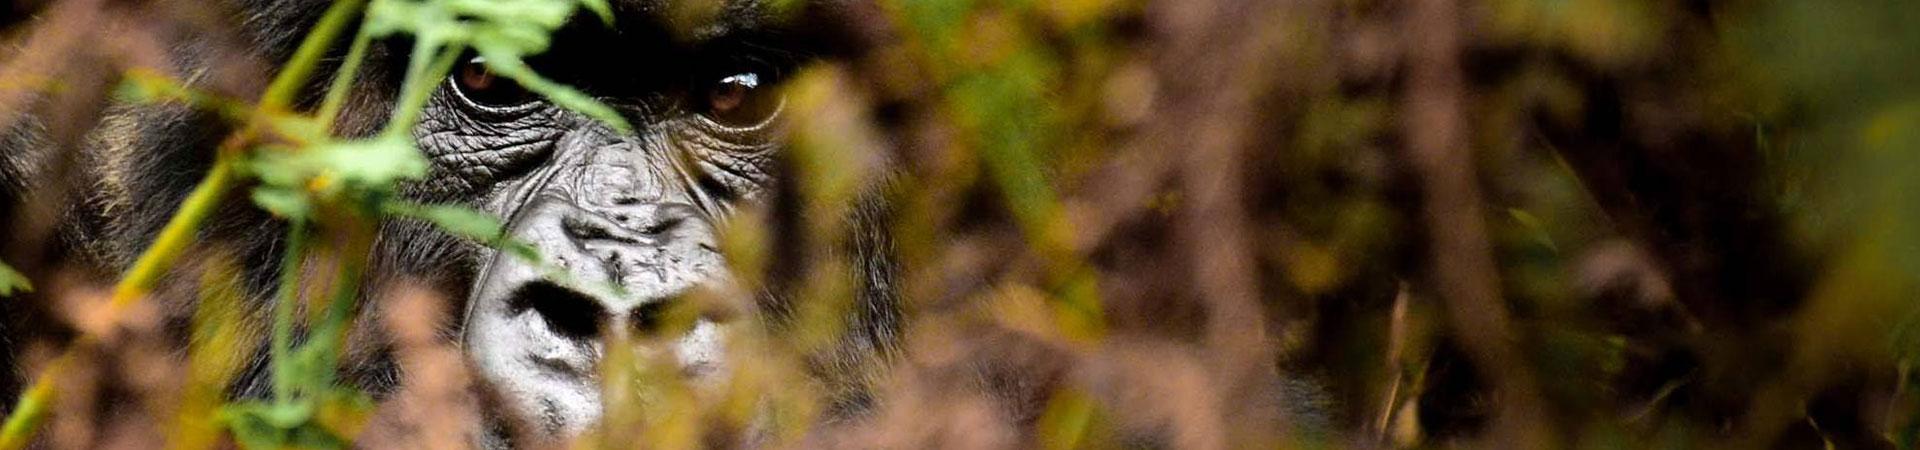 3-Day-Rwanda-Gorilla-Trekking